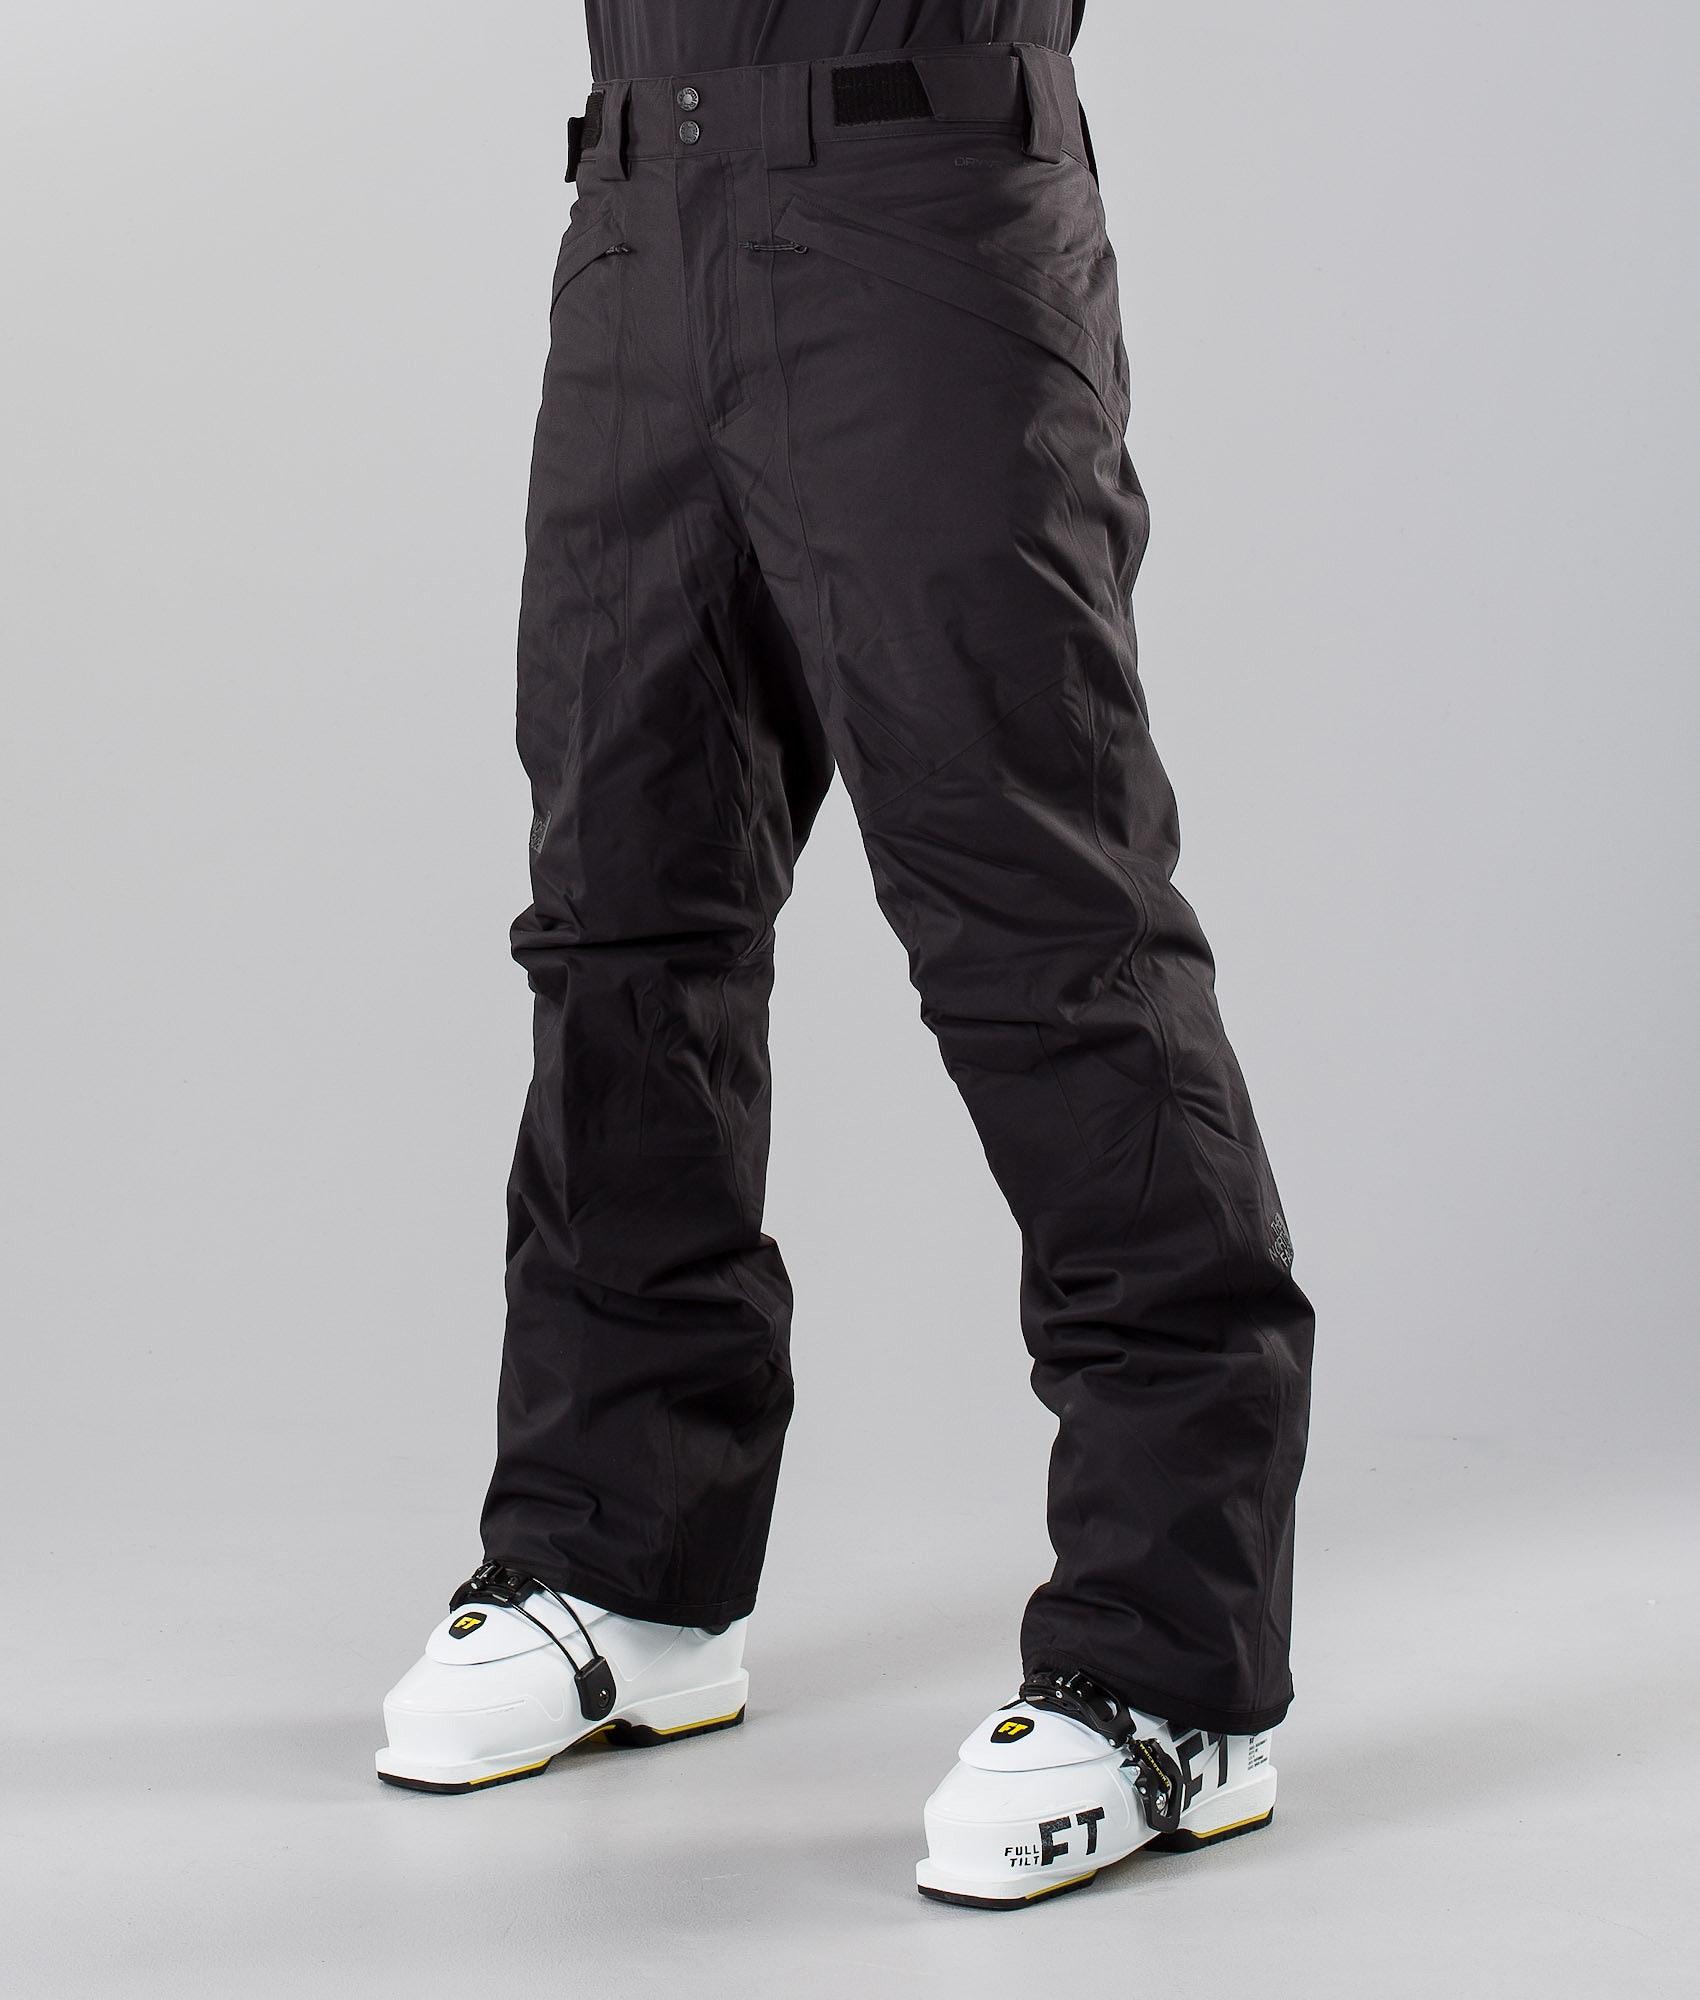 146288f7629 The North Face Presena Ski Pants Black - Ridestore.com